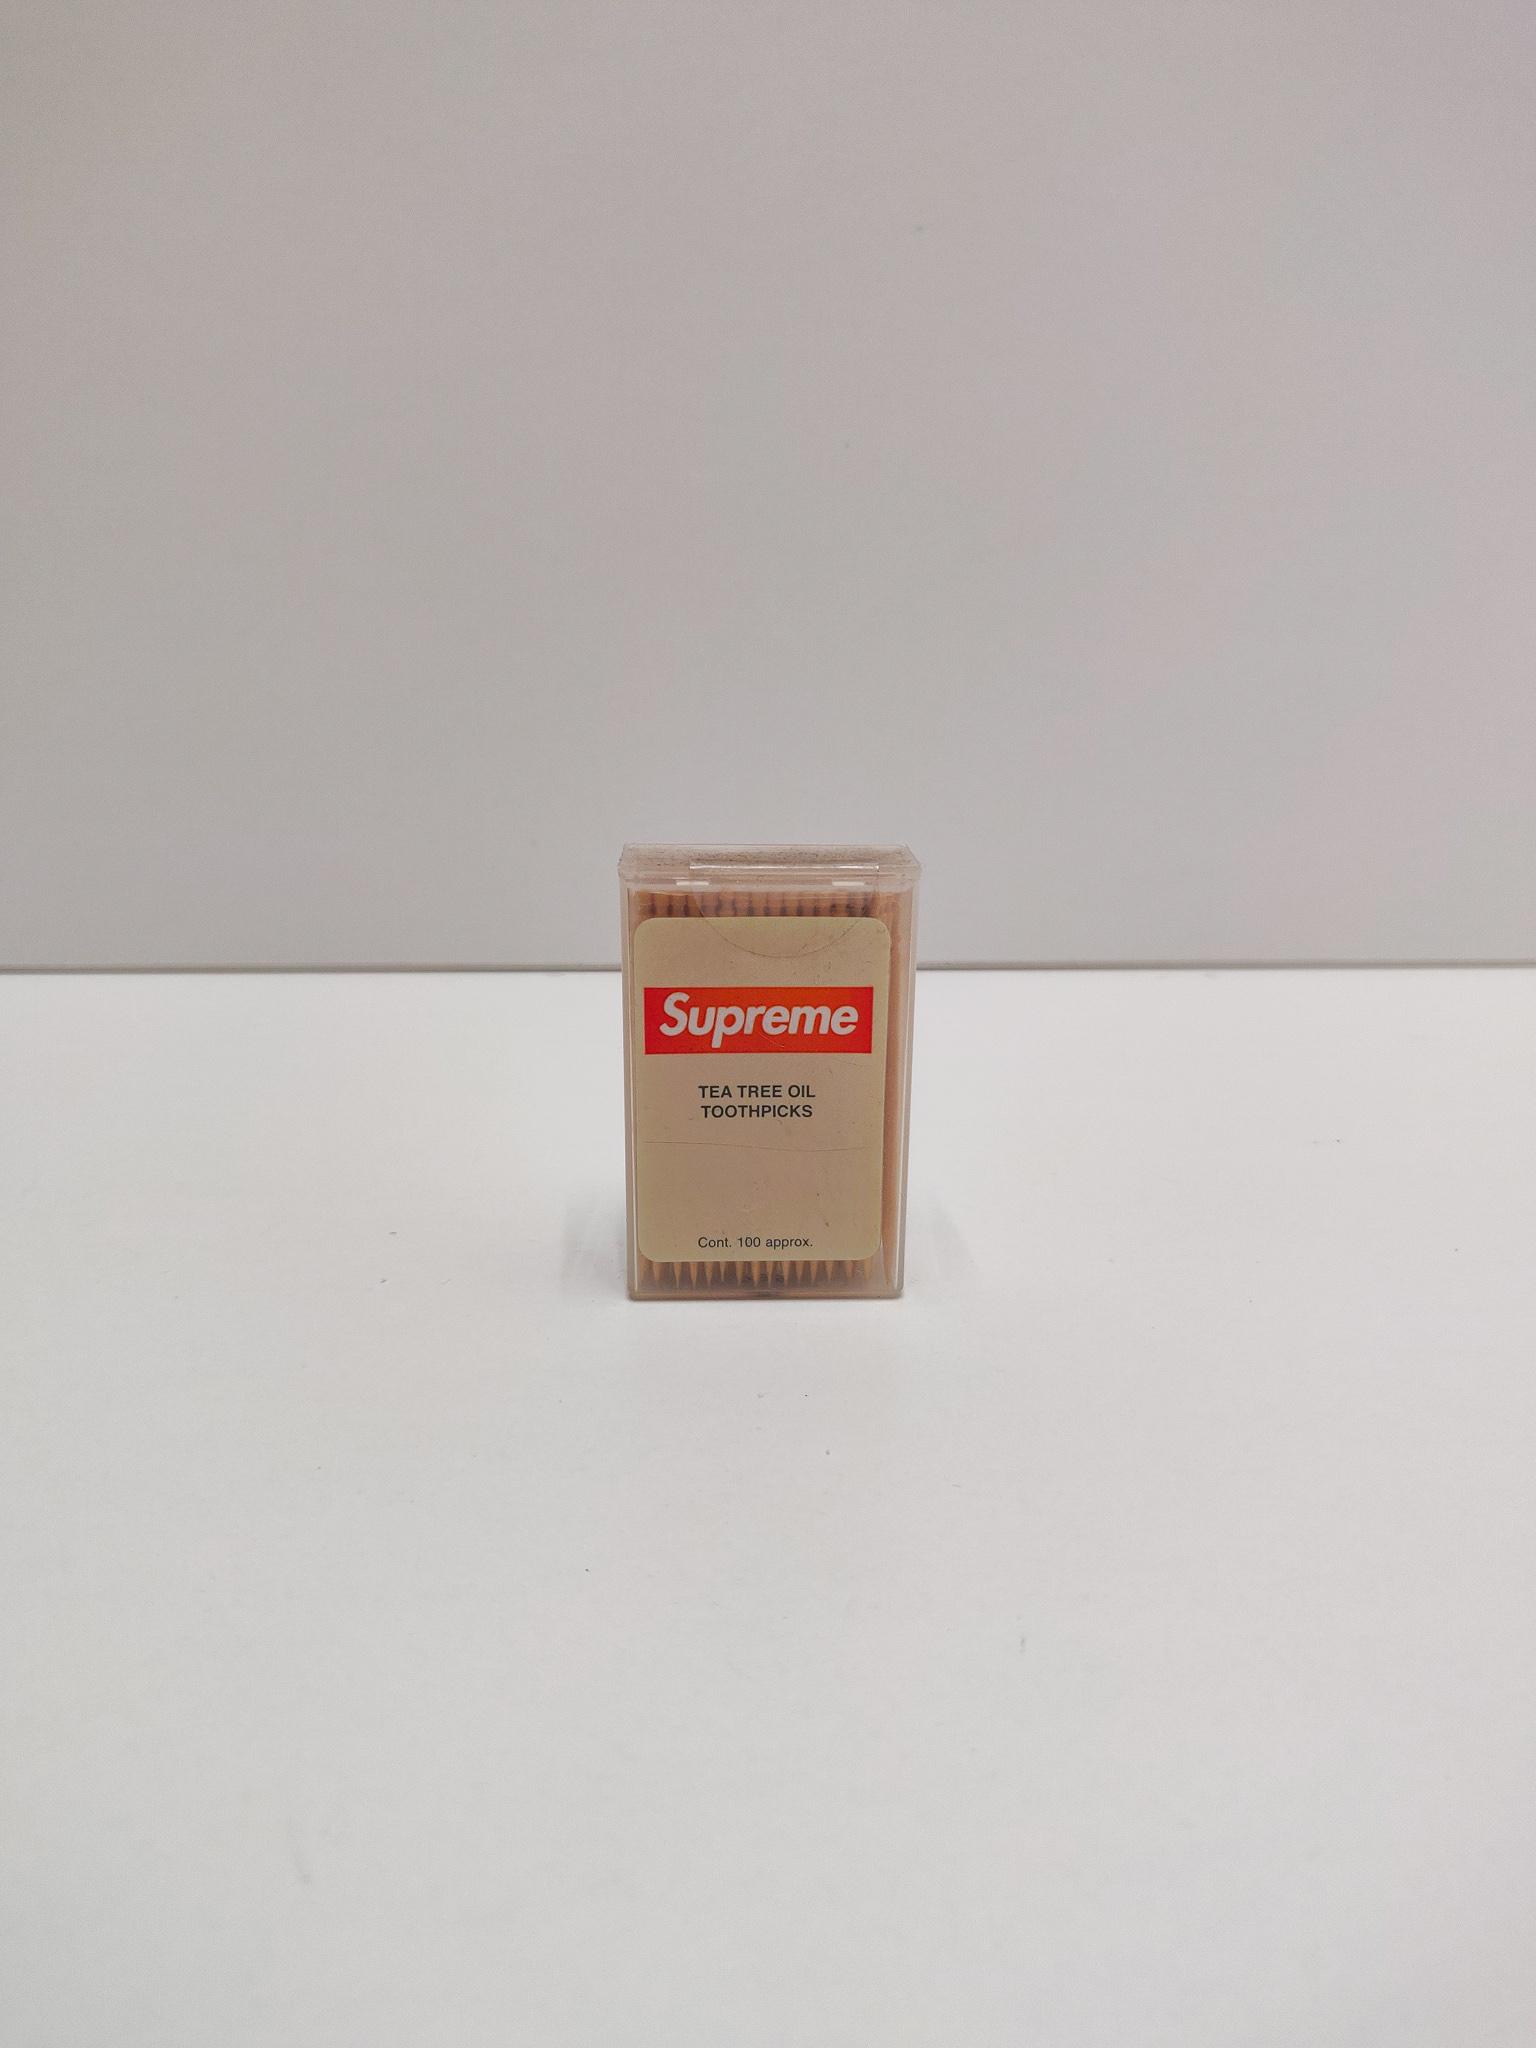 Supreme Toothpicks